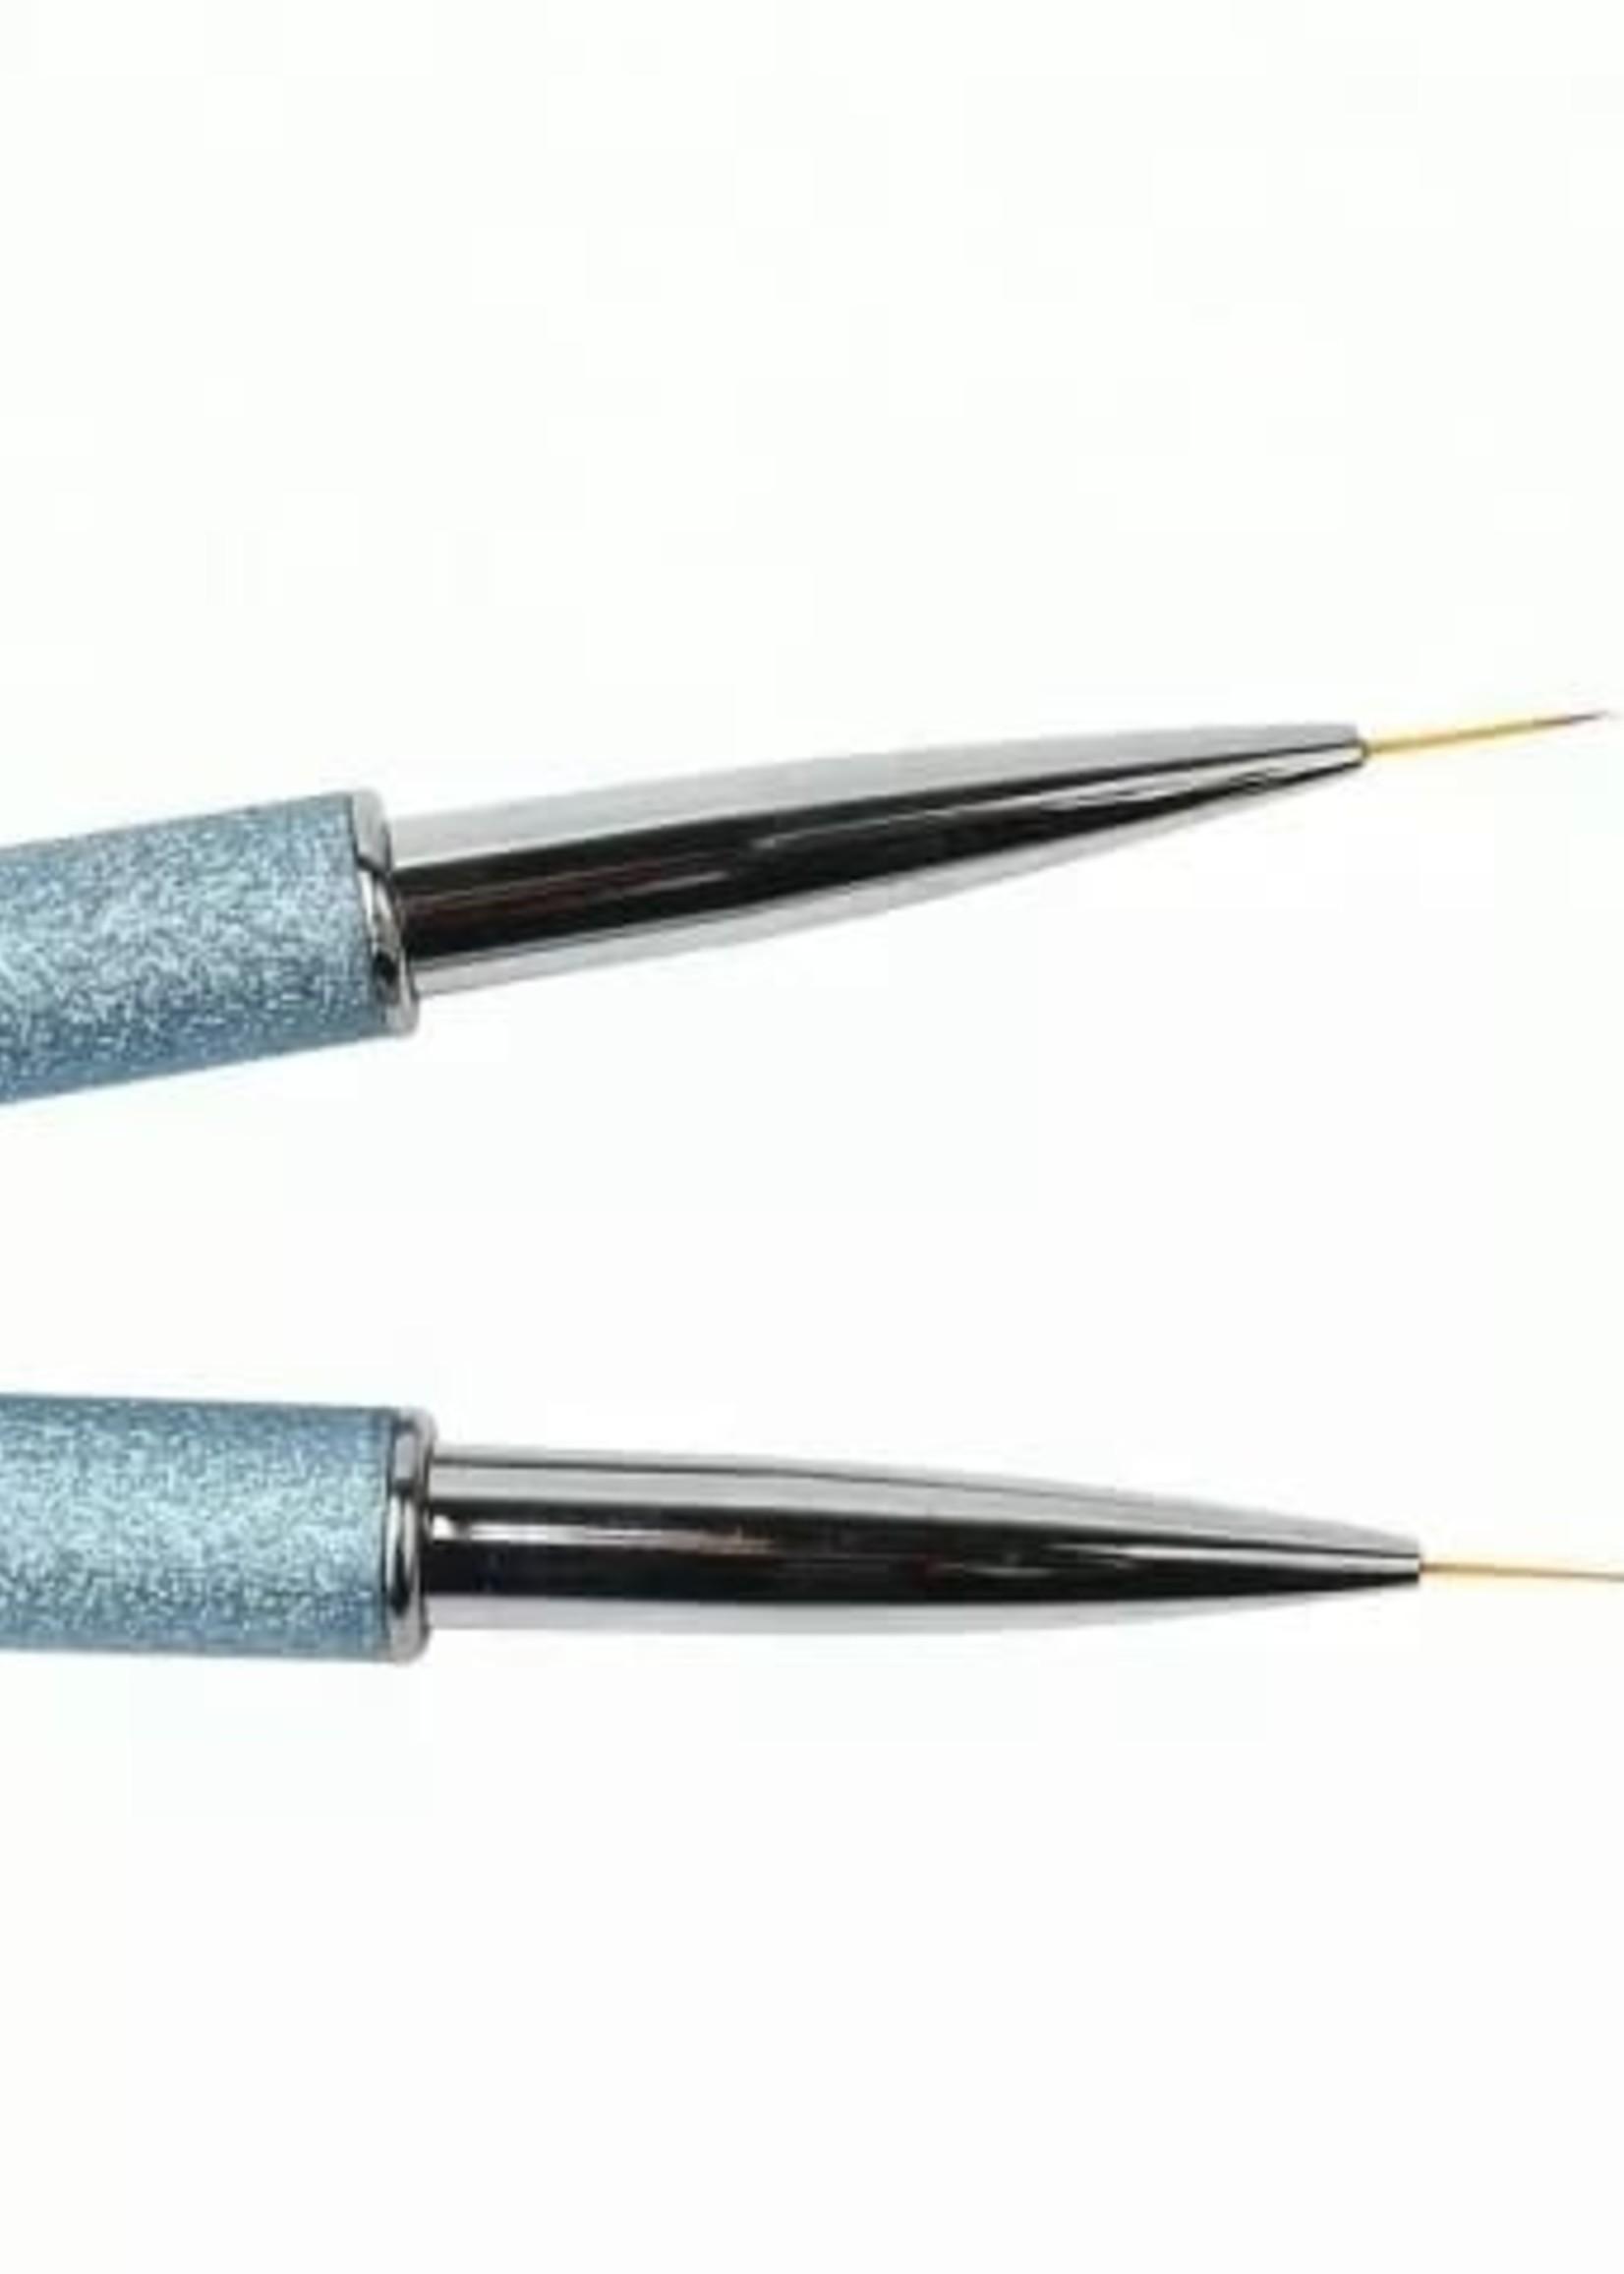 Set de pinceles para uñas 3 piezas